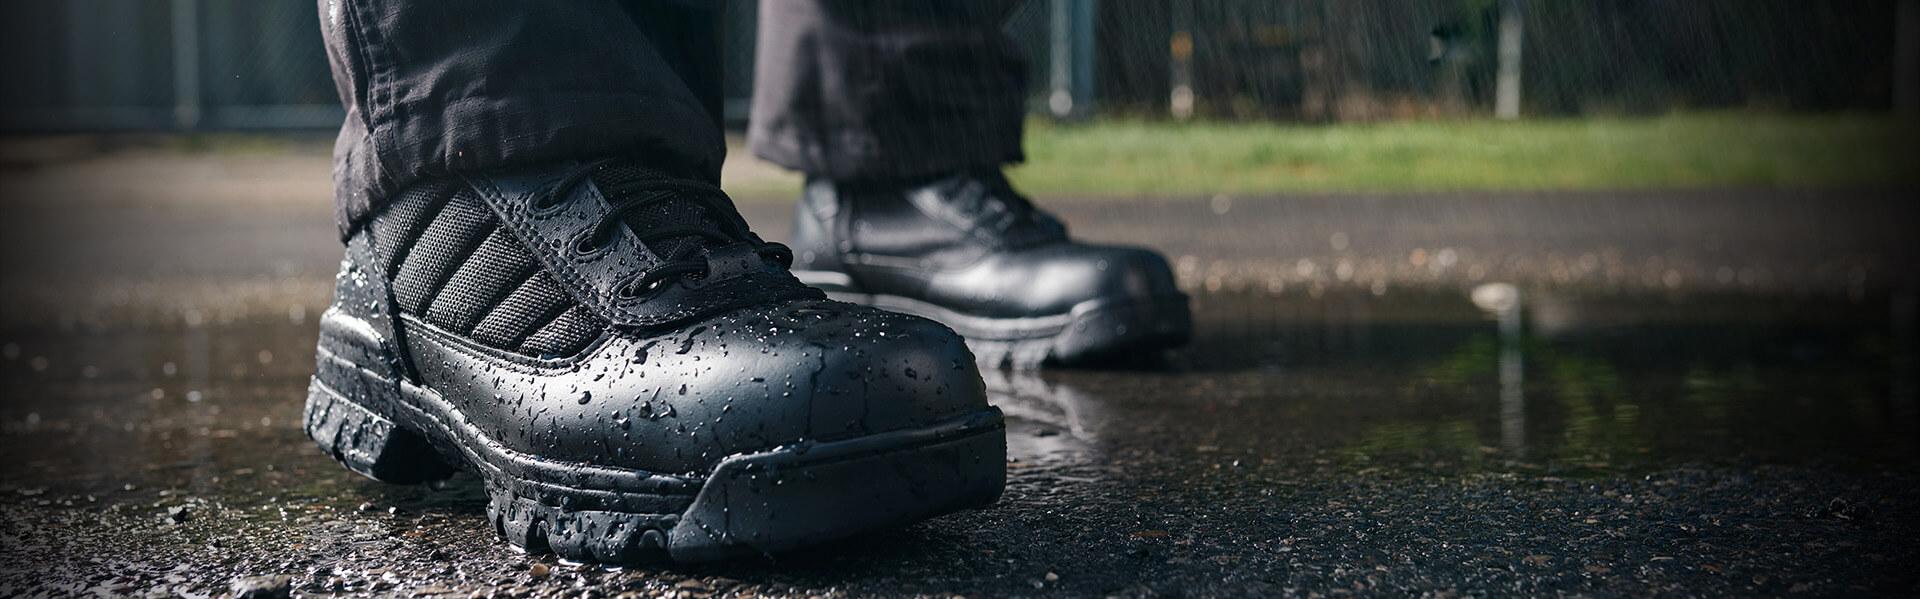 Ultralites standing on wet pavement.